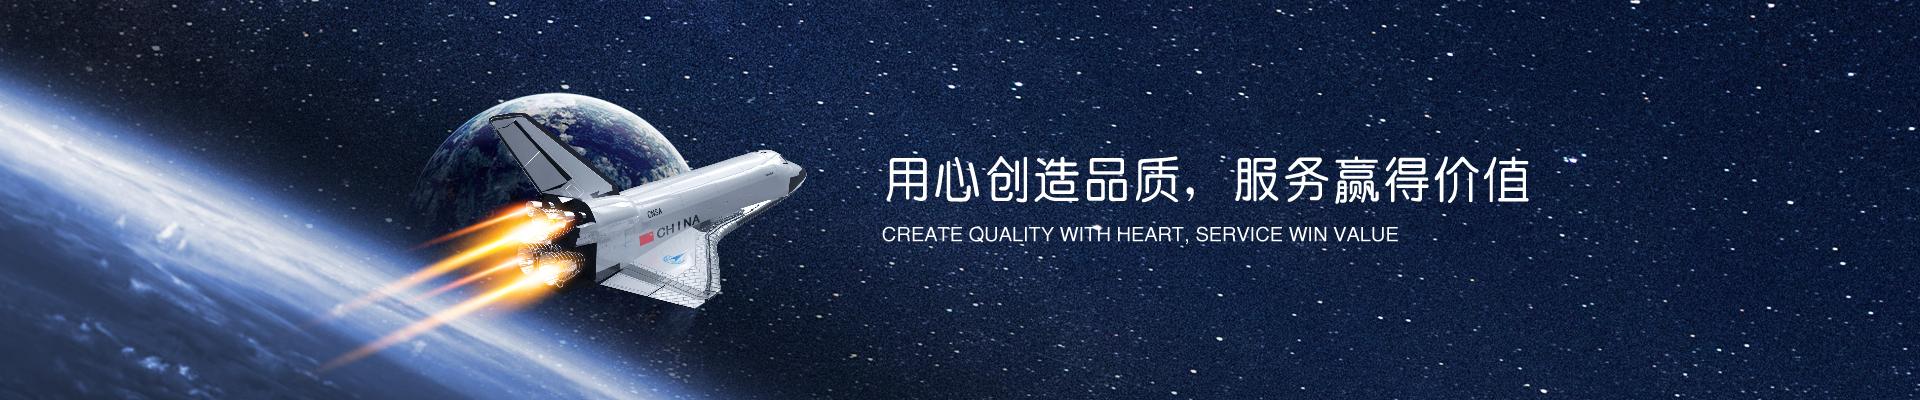 http://www.yousejinshu.com.cn/data/upload/201912/20191212140808_205.jpg